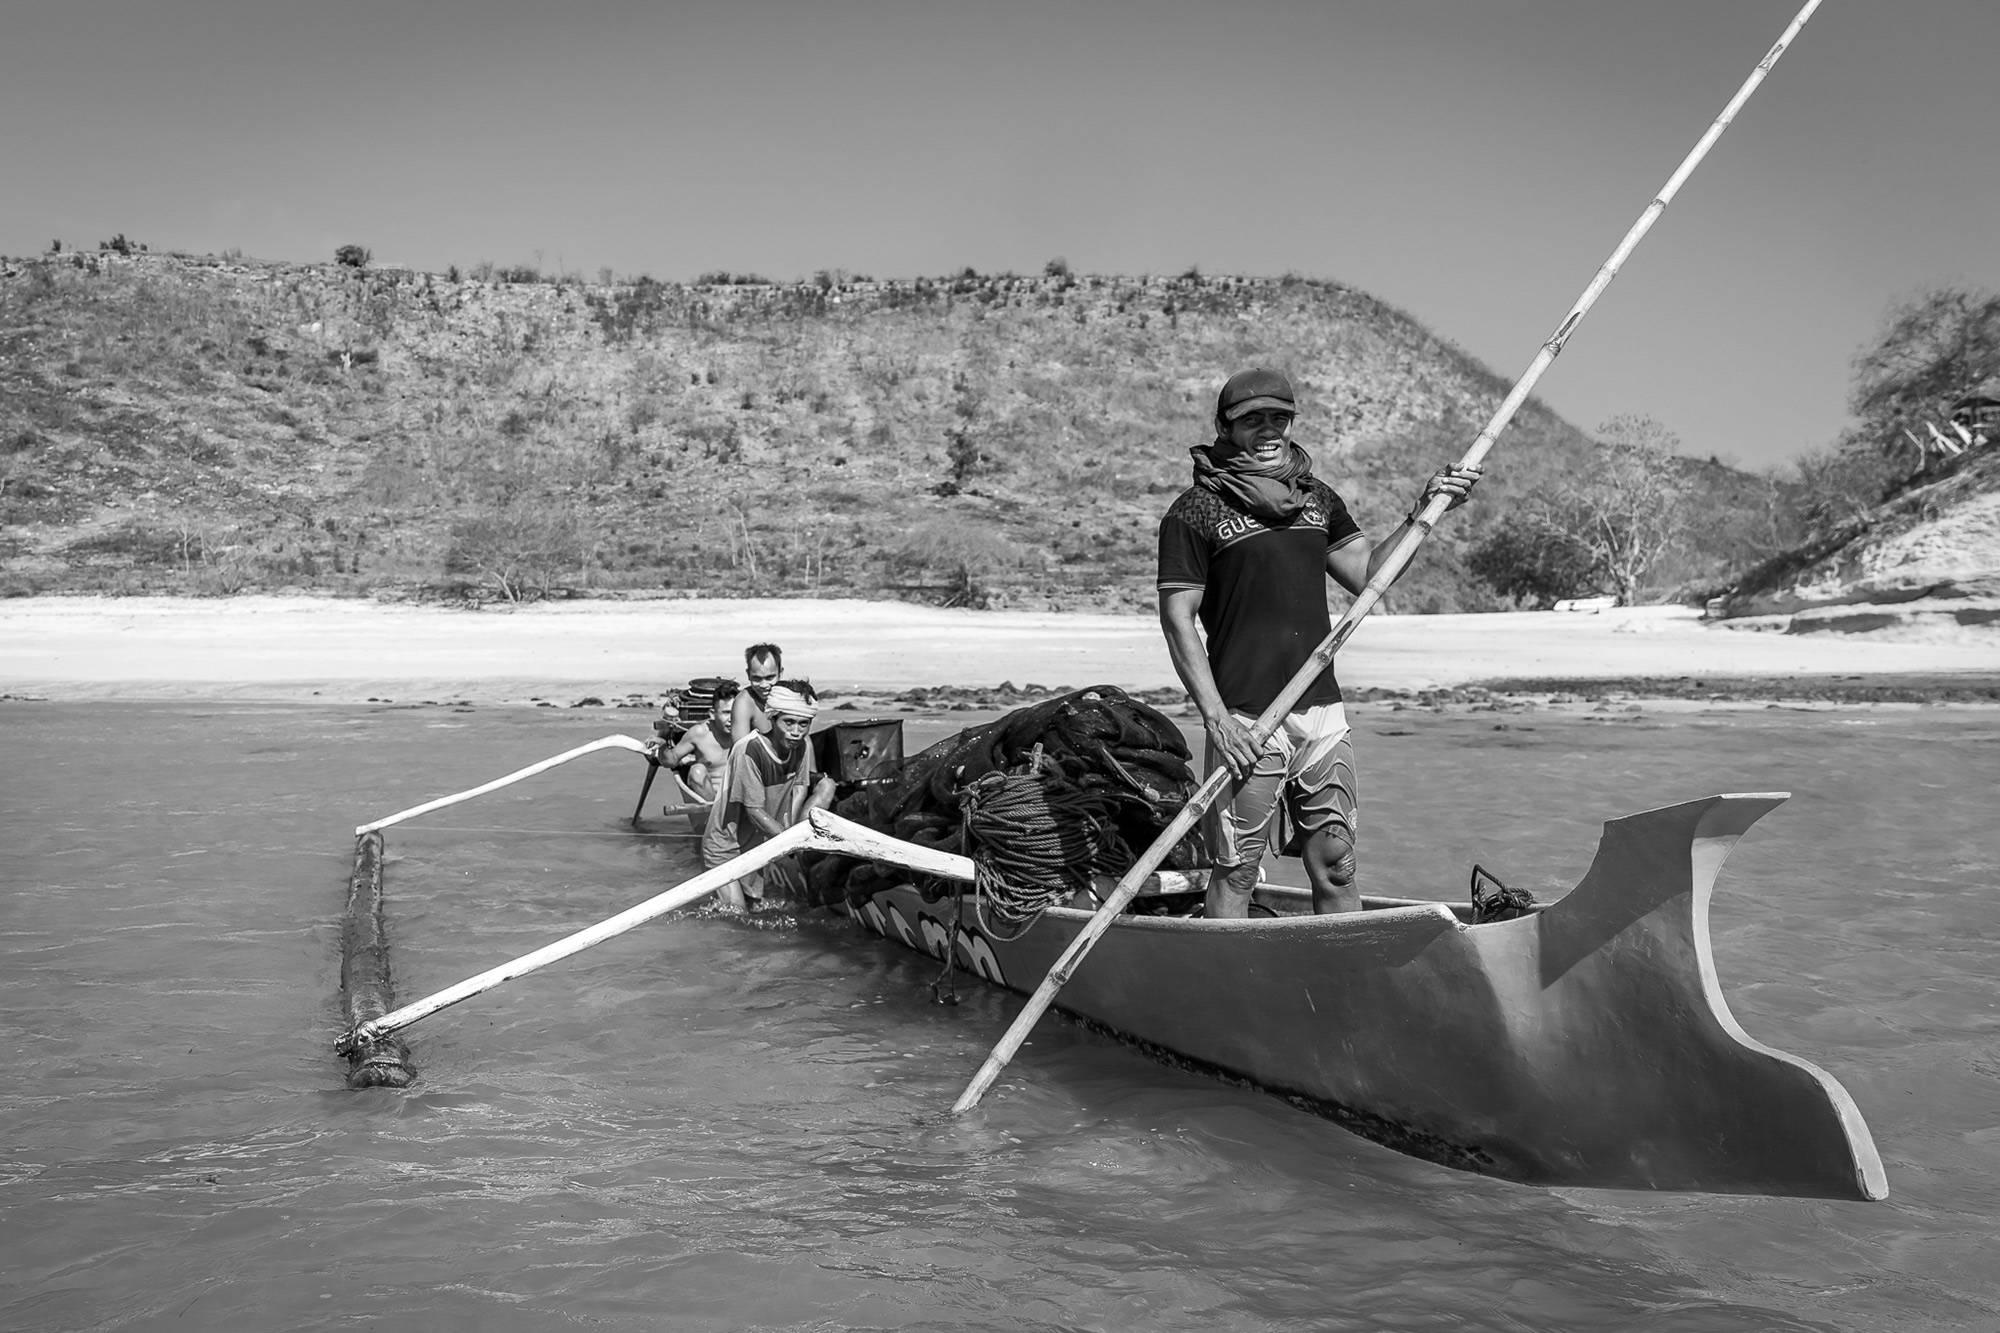 https://www.soulandsurf.com/wp-content/uploads/2021/08/lombok-pop-up-2019-Copy-of-Lombok-pop-up-local-area-@peterchamberlainphotoI11A3044-91.jpg